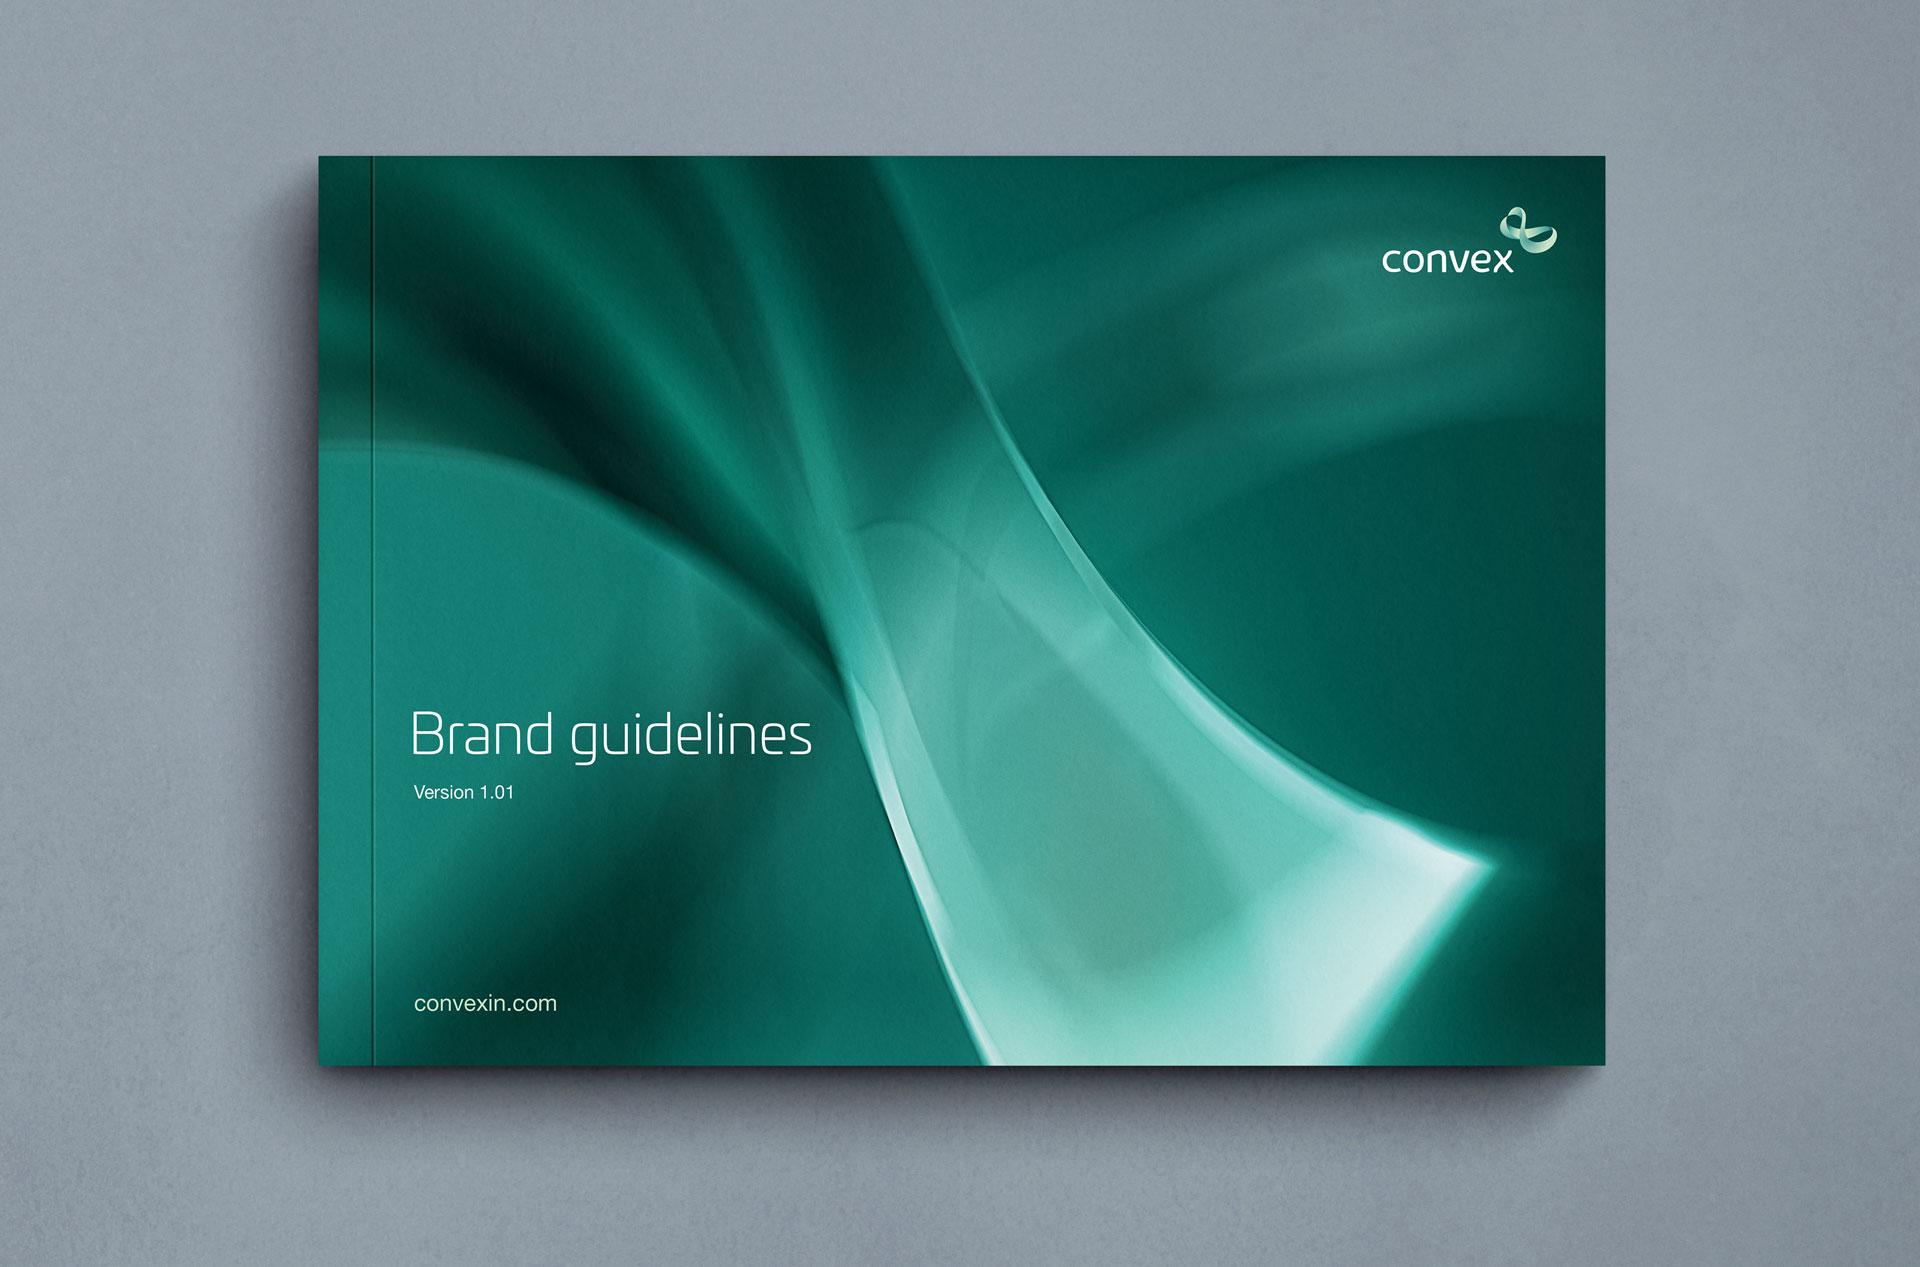 Glendale Creative Convex Brand Guidelines